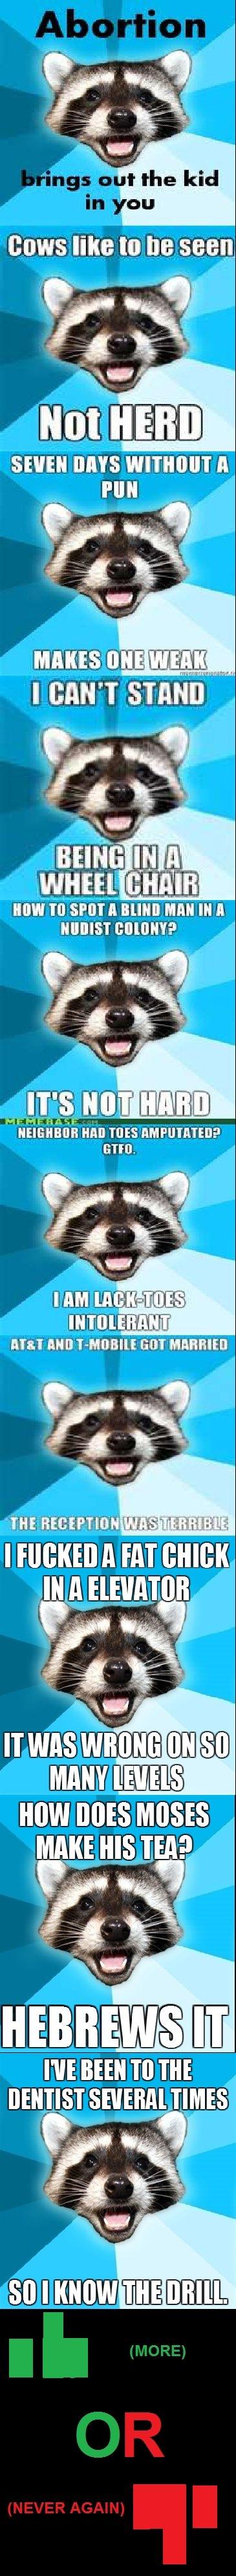 Lame Pun Raccoon Comp. Hope You Enjoyed! Thumb Up For More!. SPOT l tlel I taus. viii. HM] WEE HM Plai, ? tlt rakens tpb